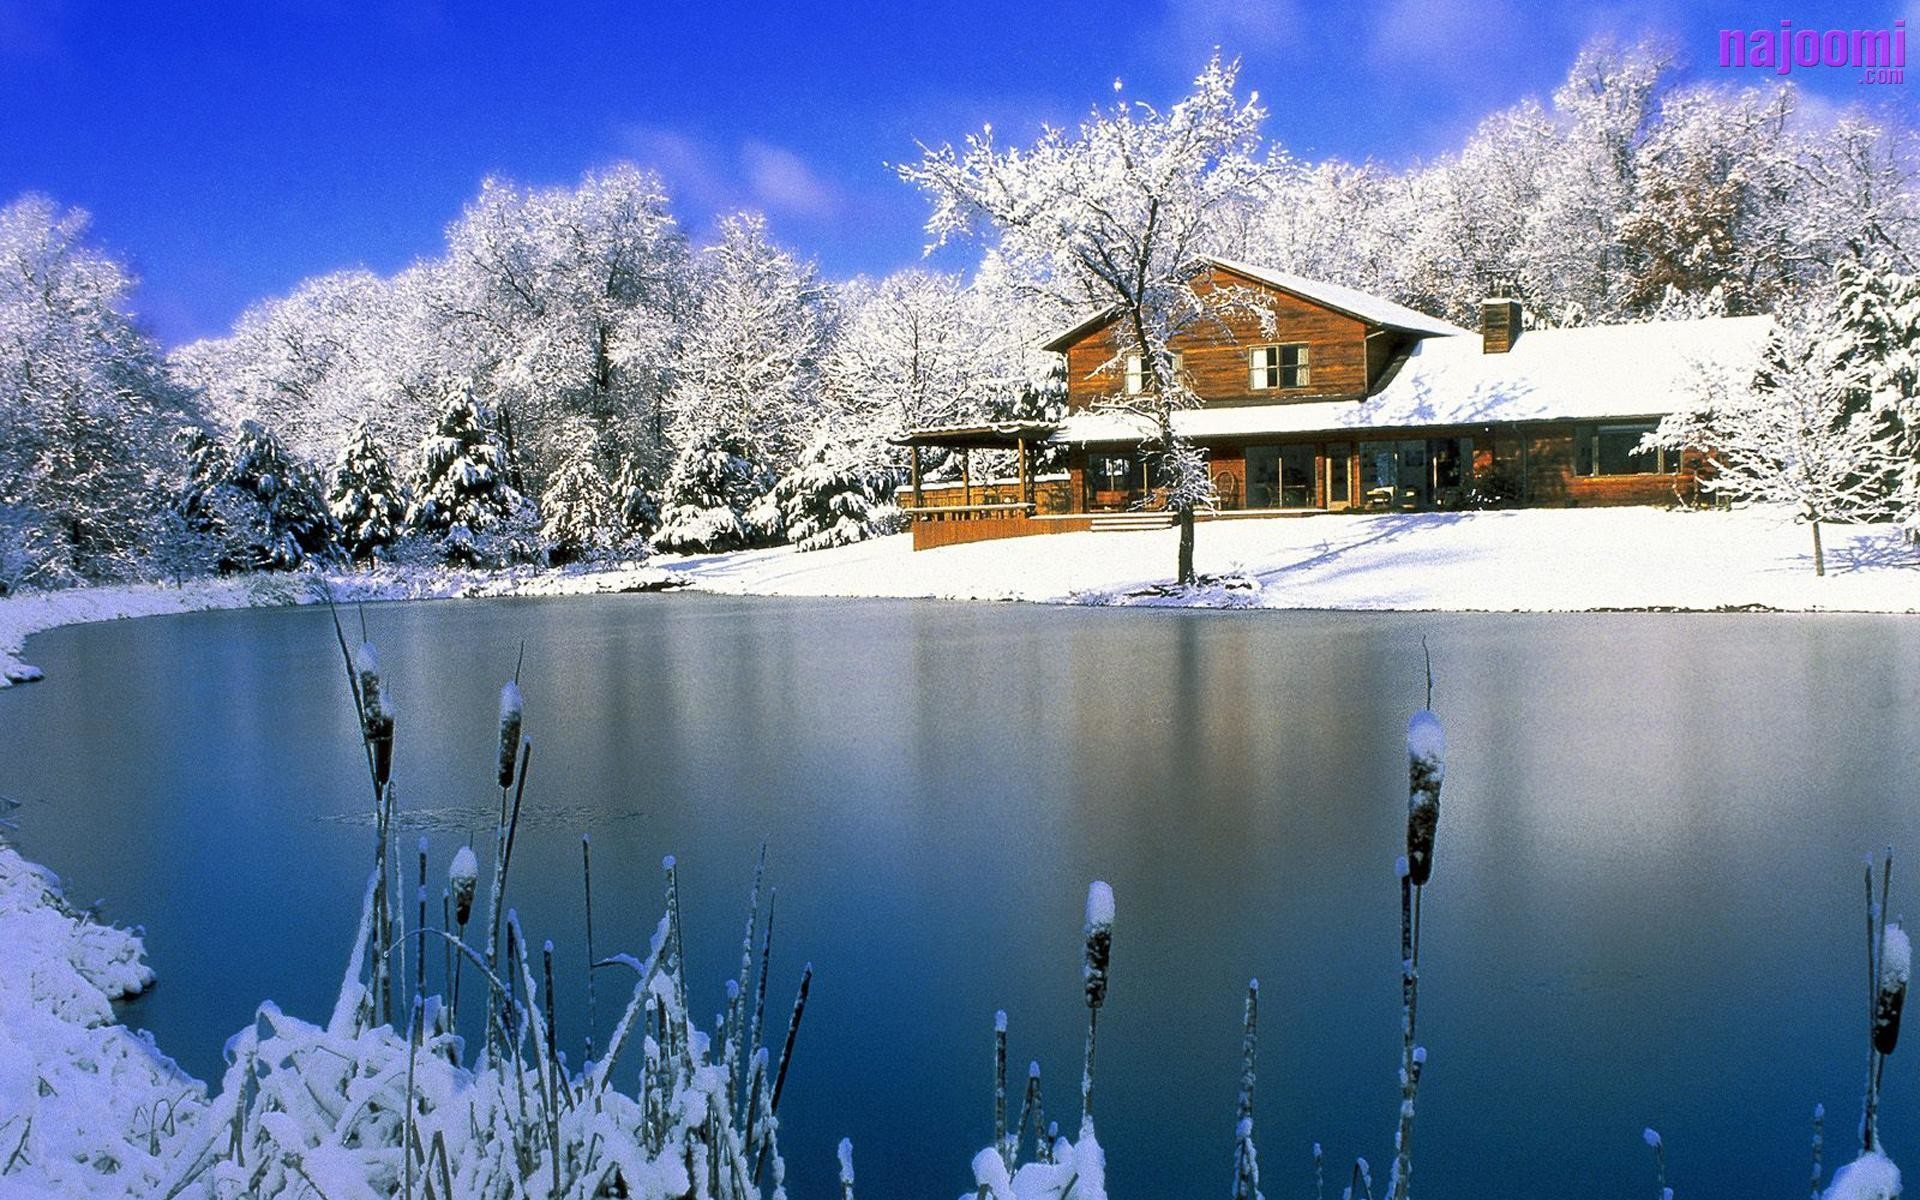 Most Beautiful Snow Scenes Wallpaper   Best Free Wallpaper